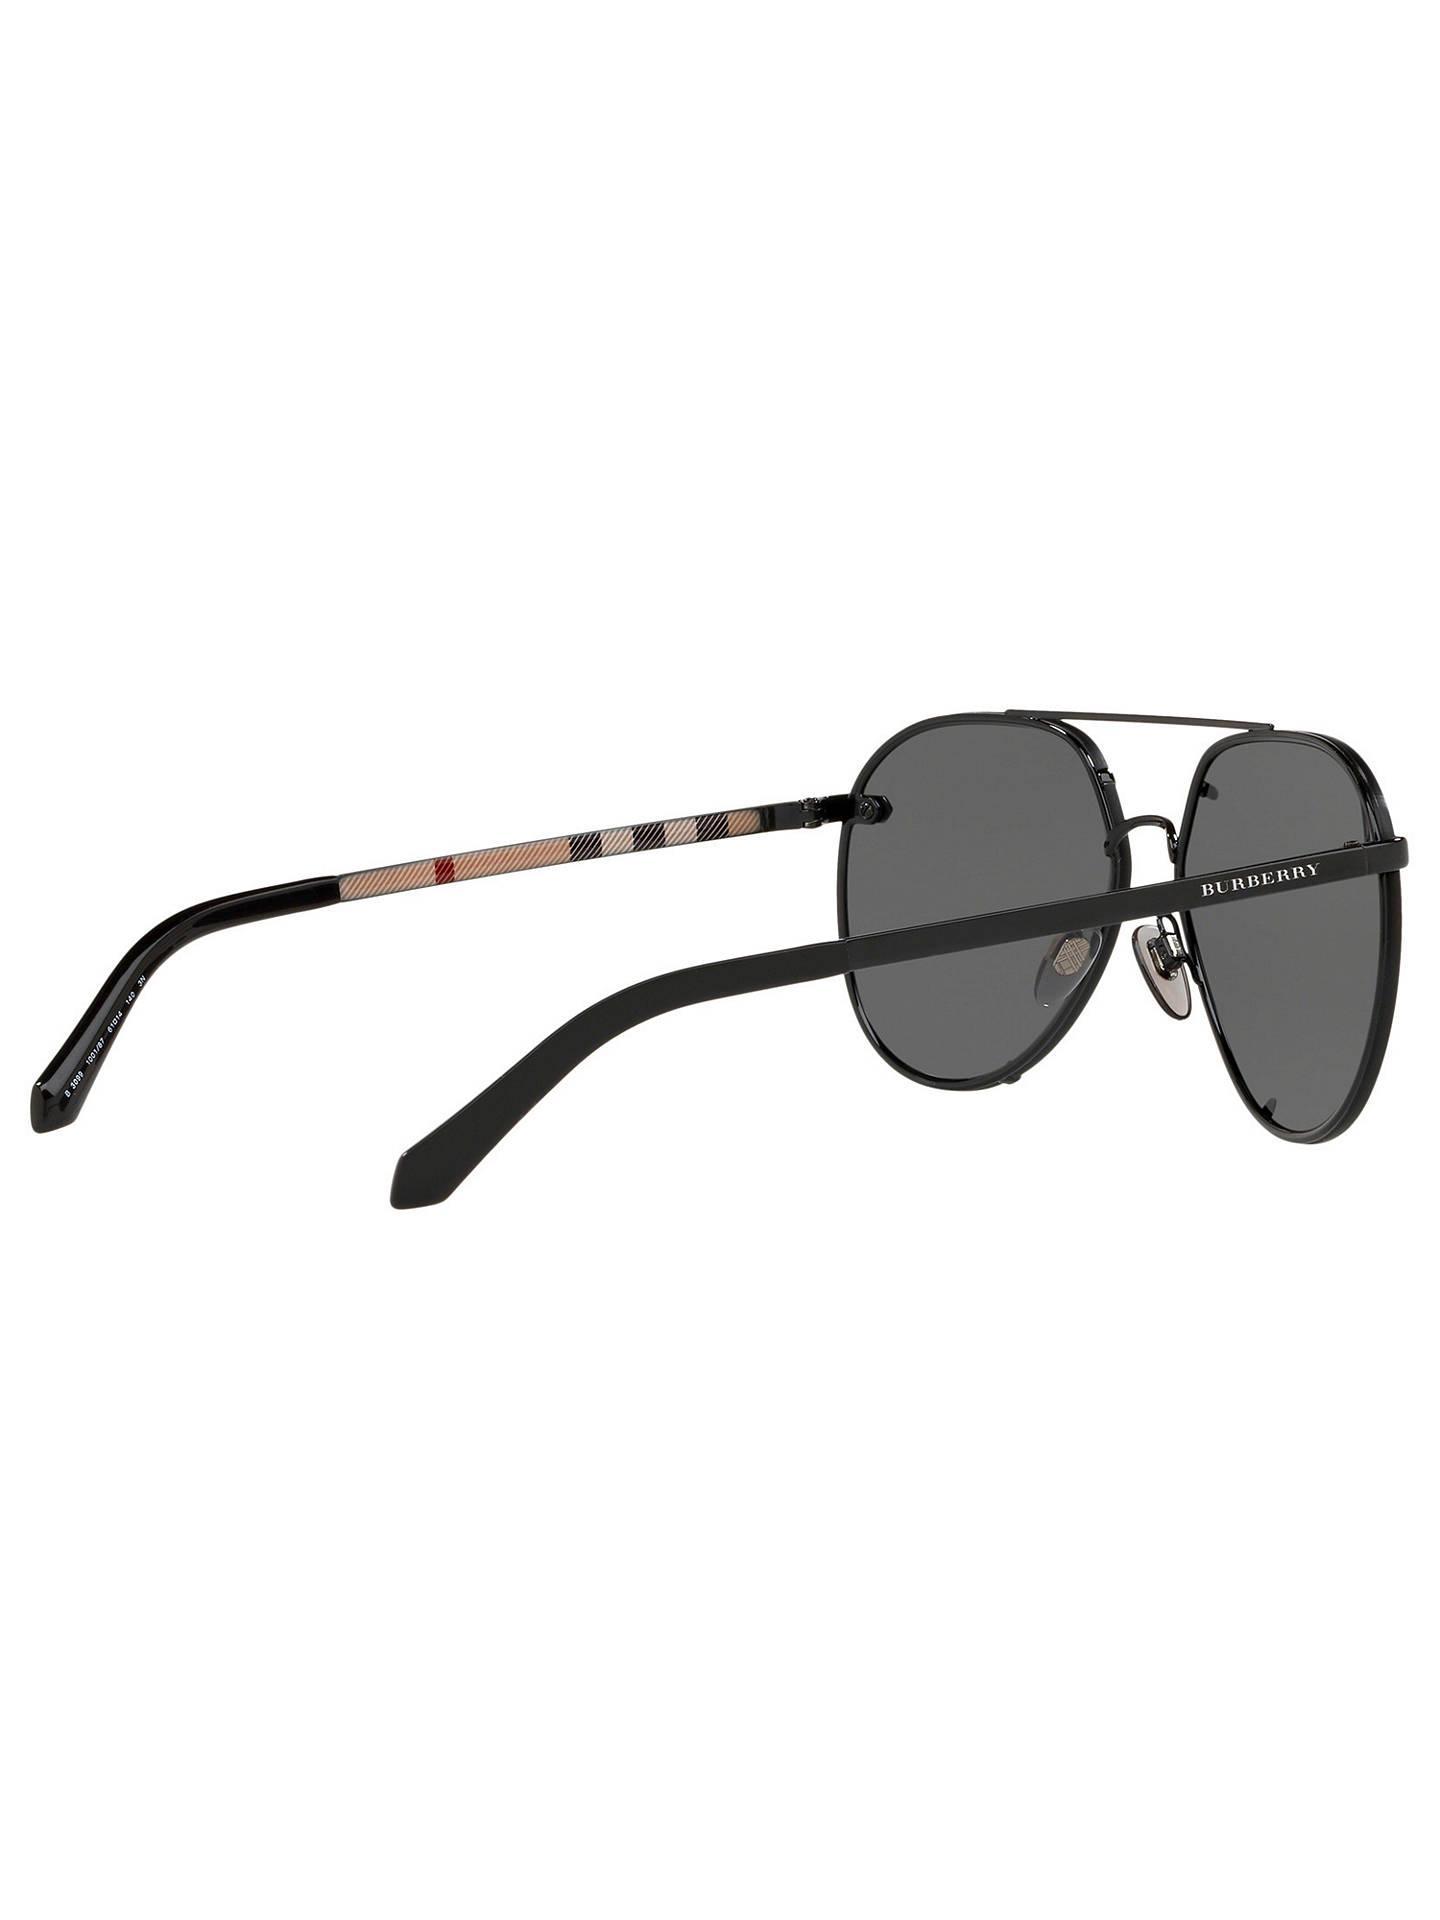 c9f10f6f3 ... Buy Burberry BE3099 Women's Aviator Sunglasses, Black Online at  johnlewis. ...